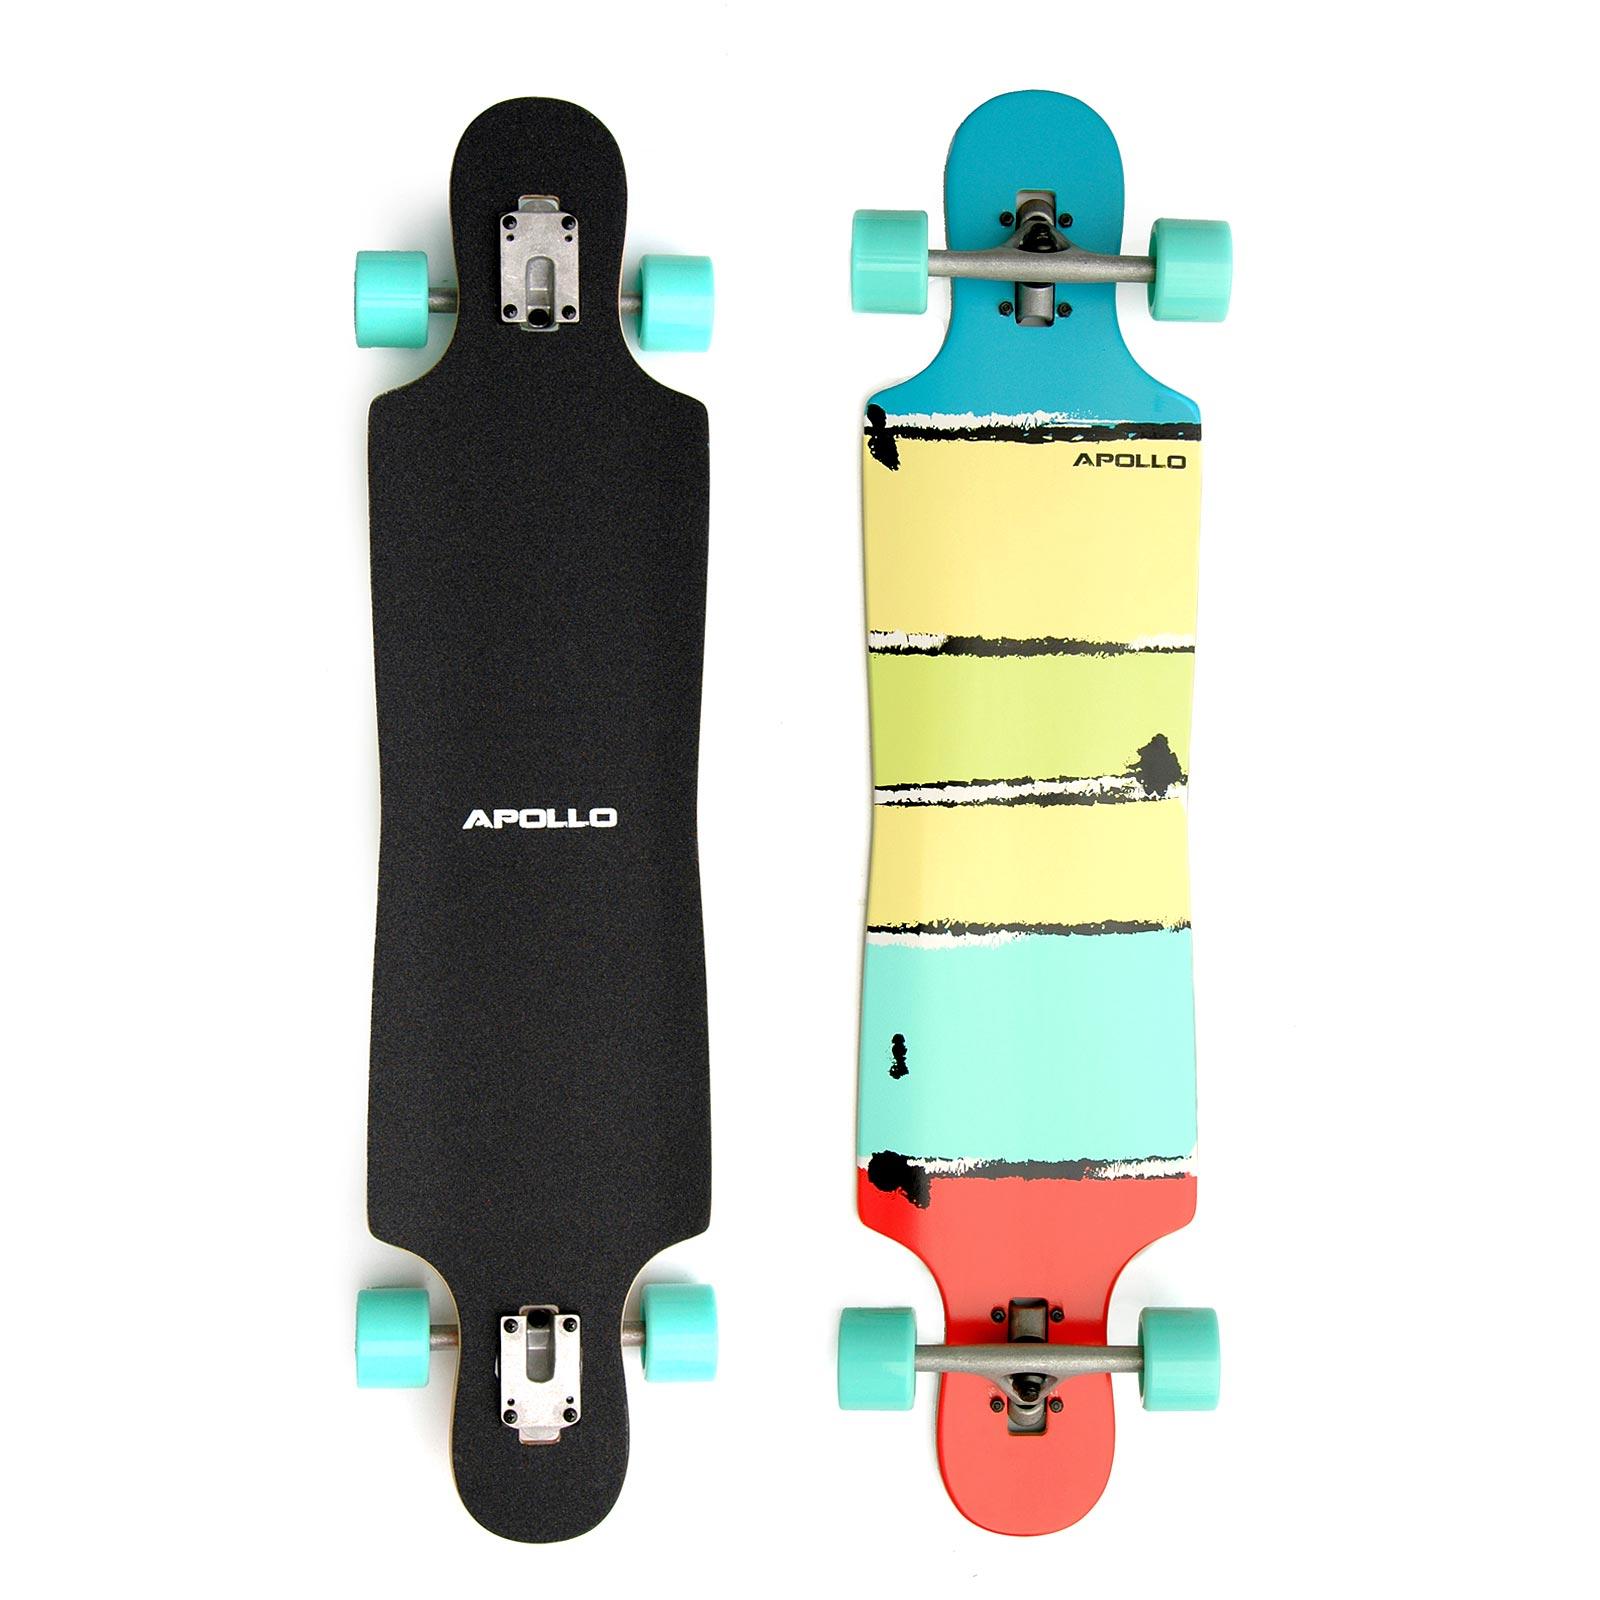 Apollo Maui Colour -Twin Tip DT Longboard Länge 101,8cm Breite 24,2cm